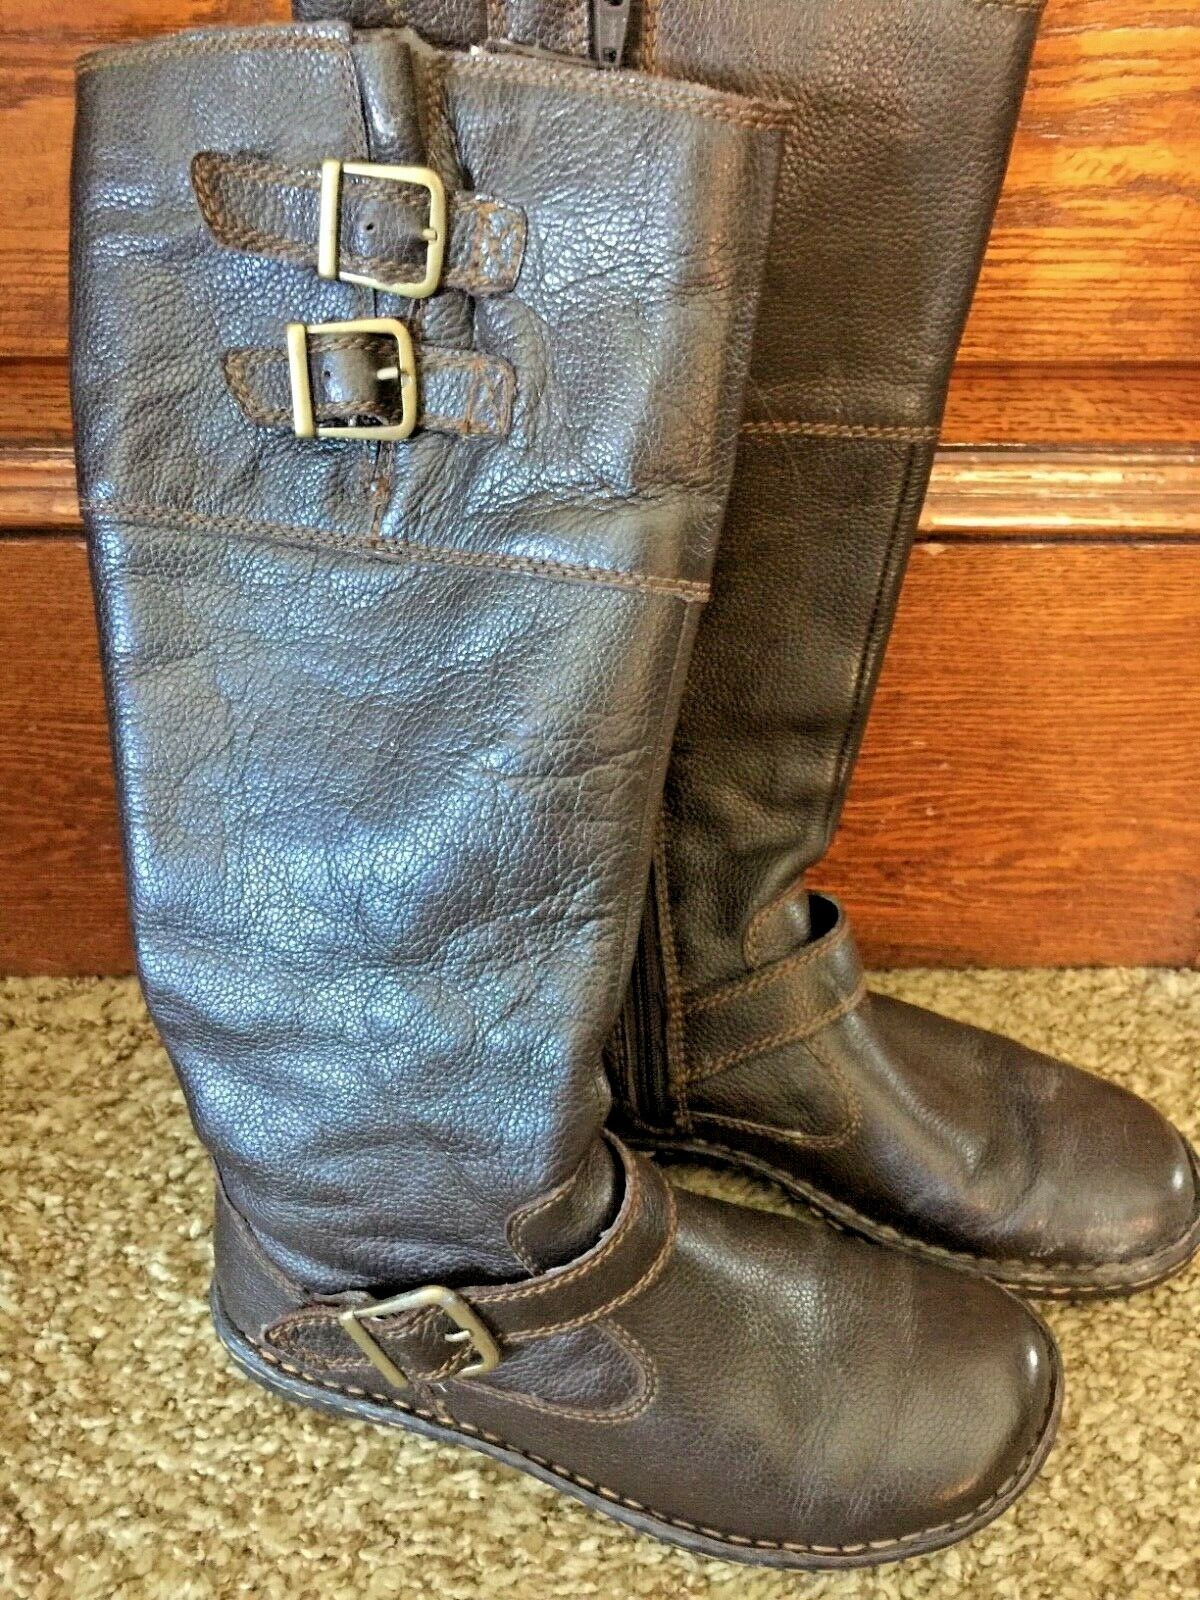 B.O.C BORN CONCEPTS Talll Brown GENUINE LEATHER Side Zipper BOOTS sz 7, EUC